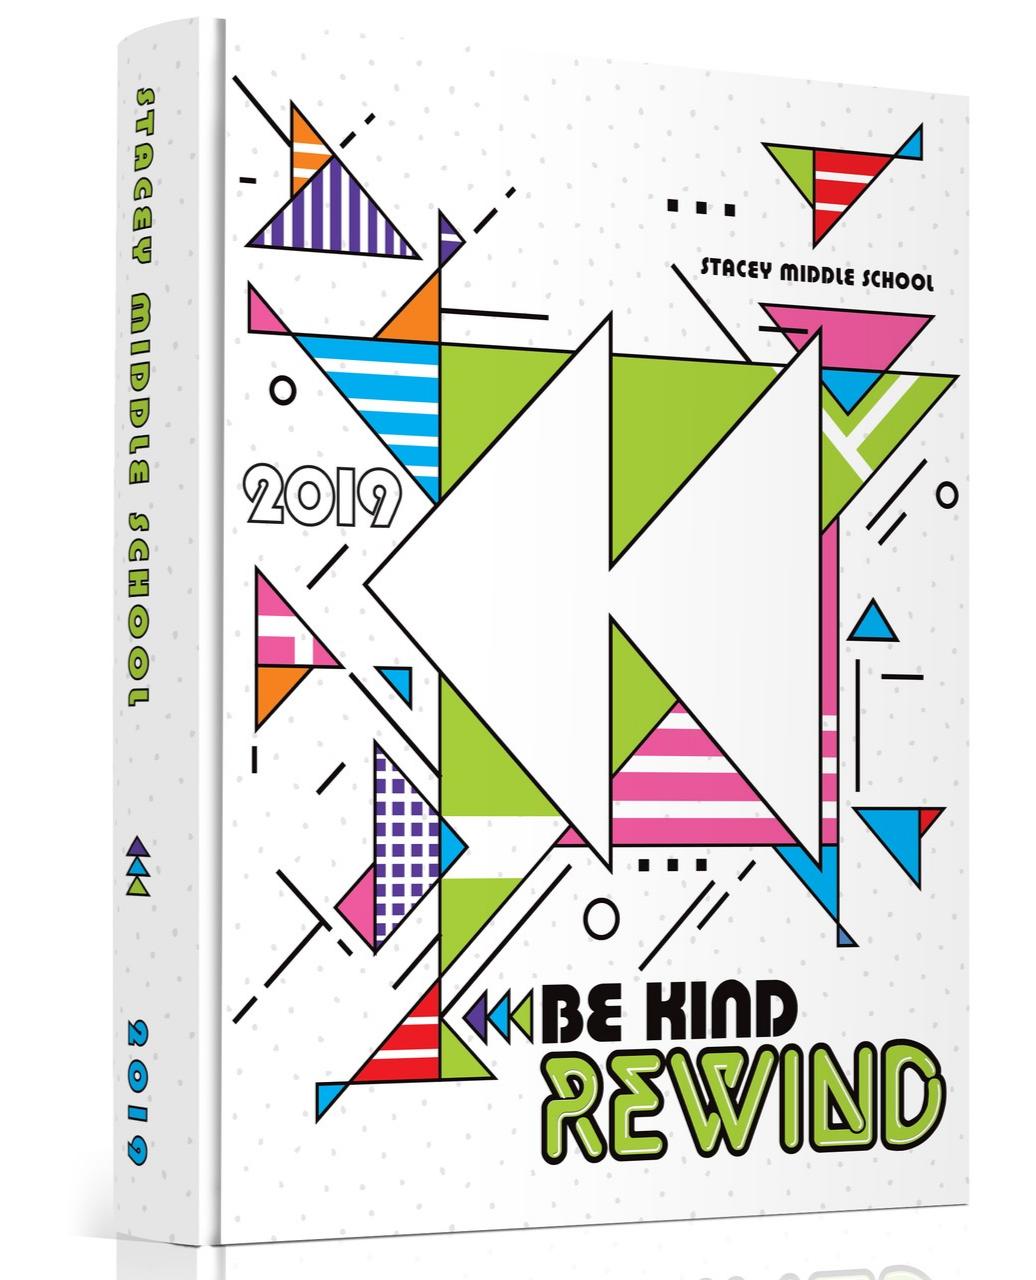 School Bookcover Design: It's #MiddleSchoolMayhem! Stacey Middle School In